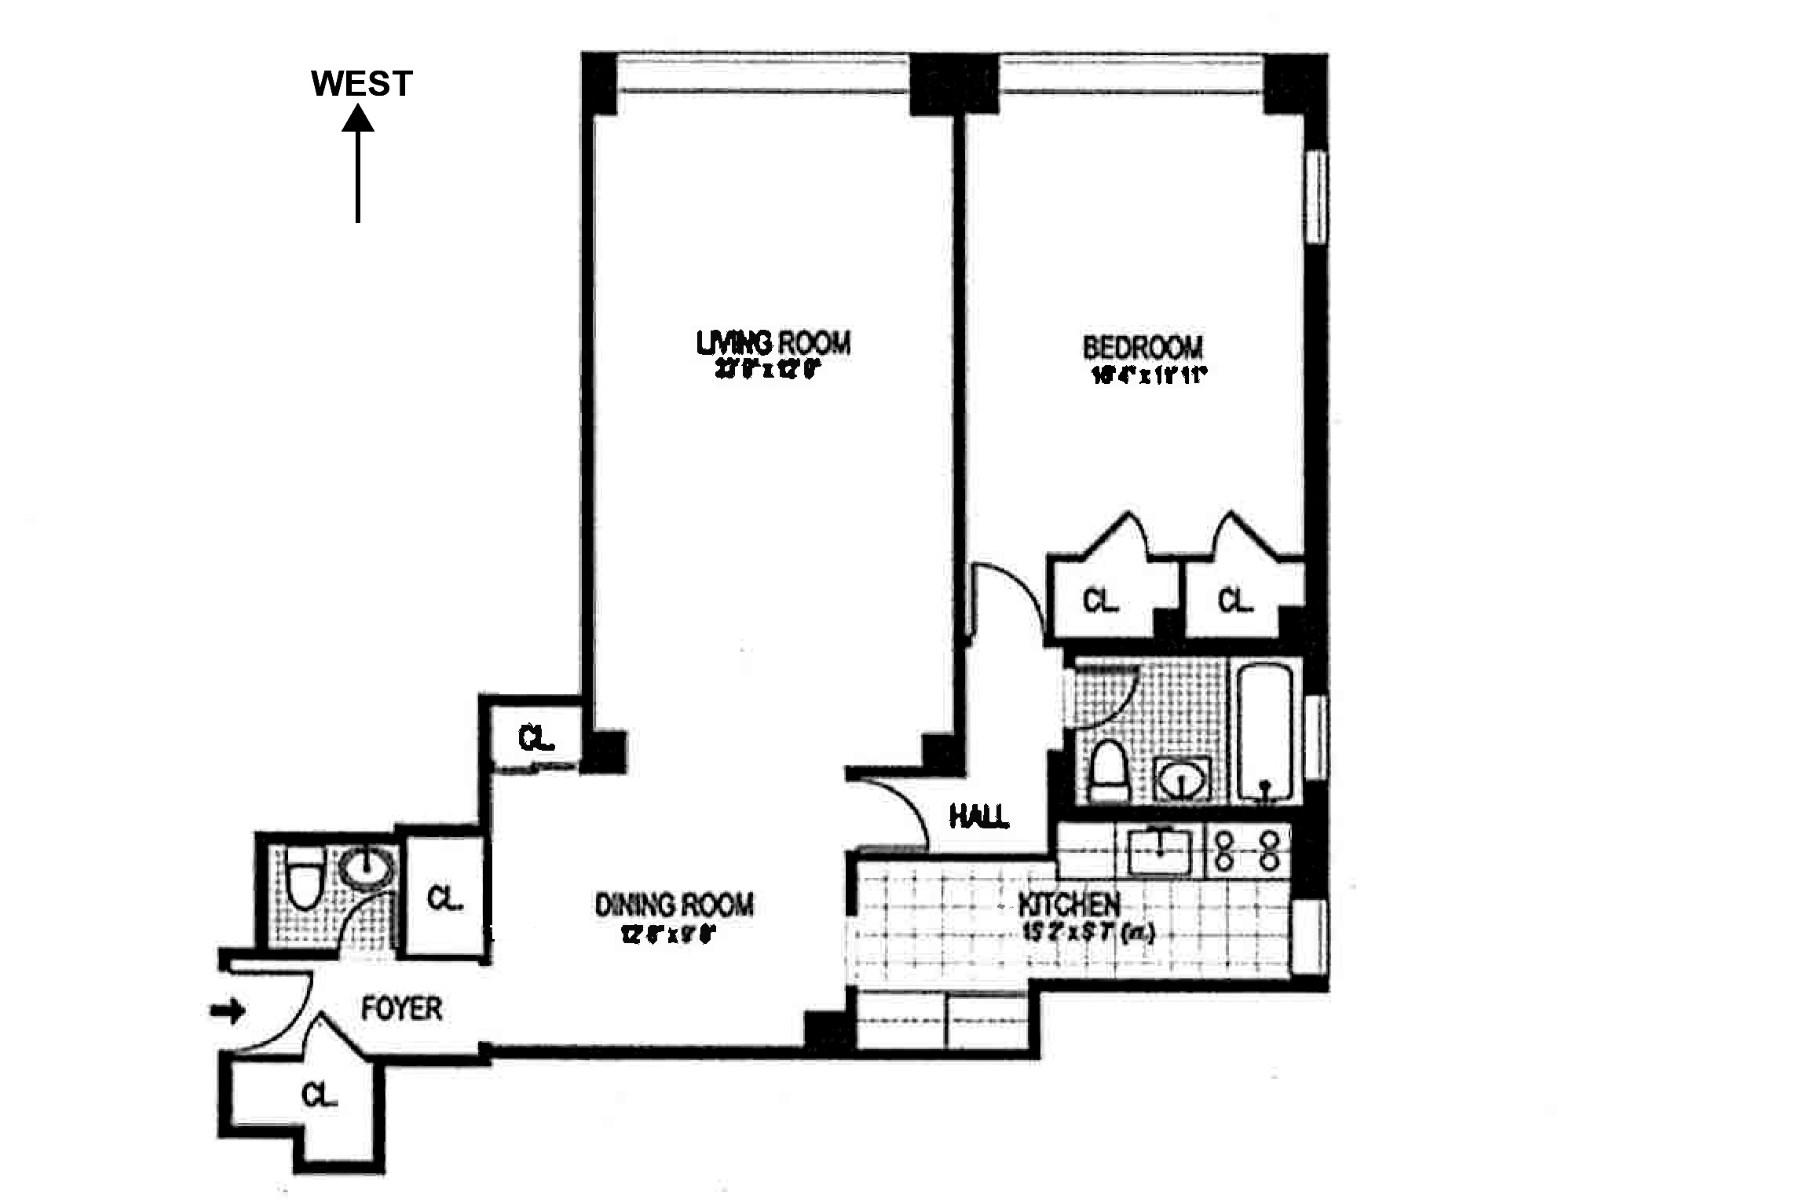 Property Of 25 Sutton Place South, Apt 9R